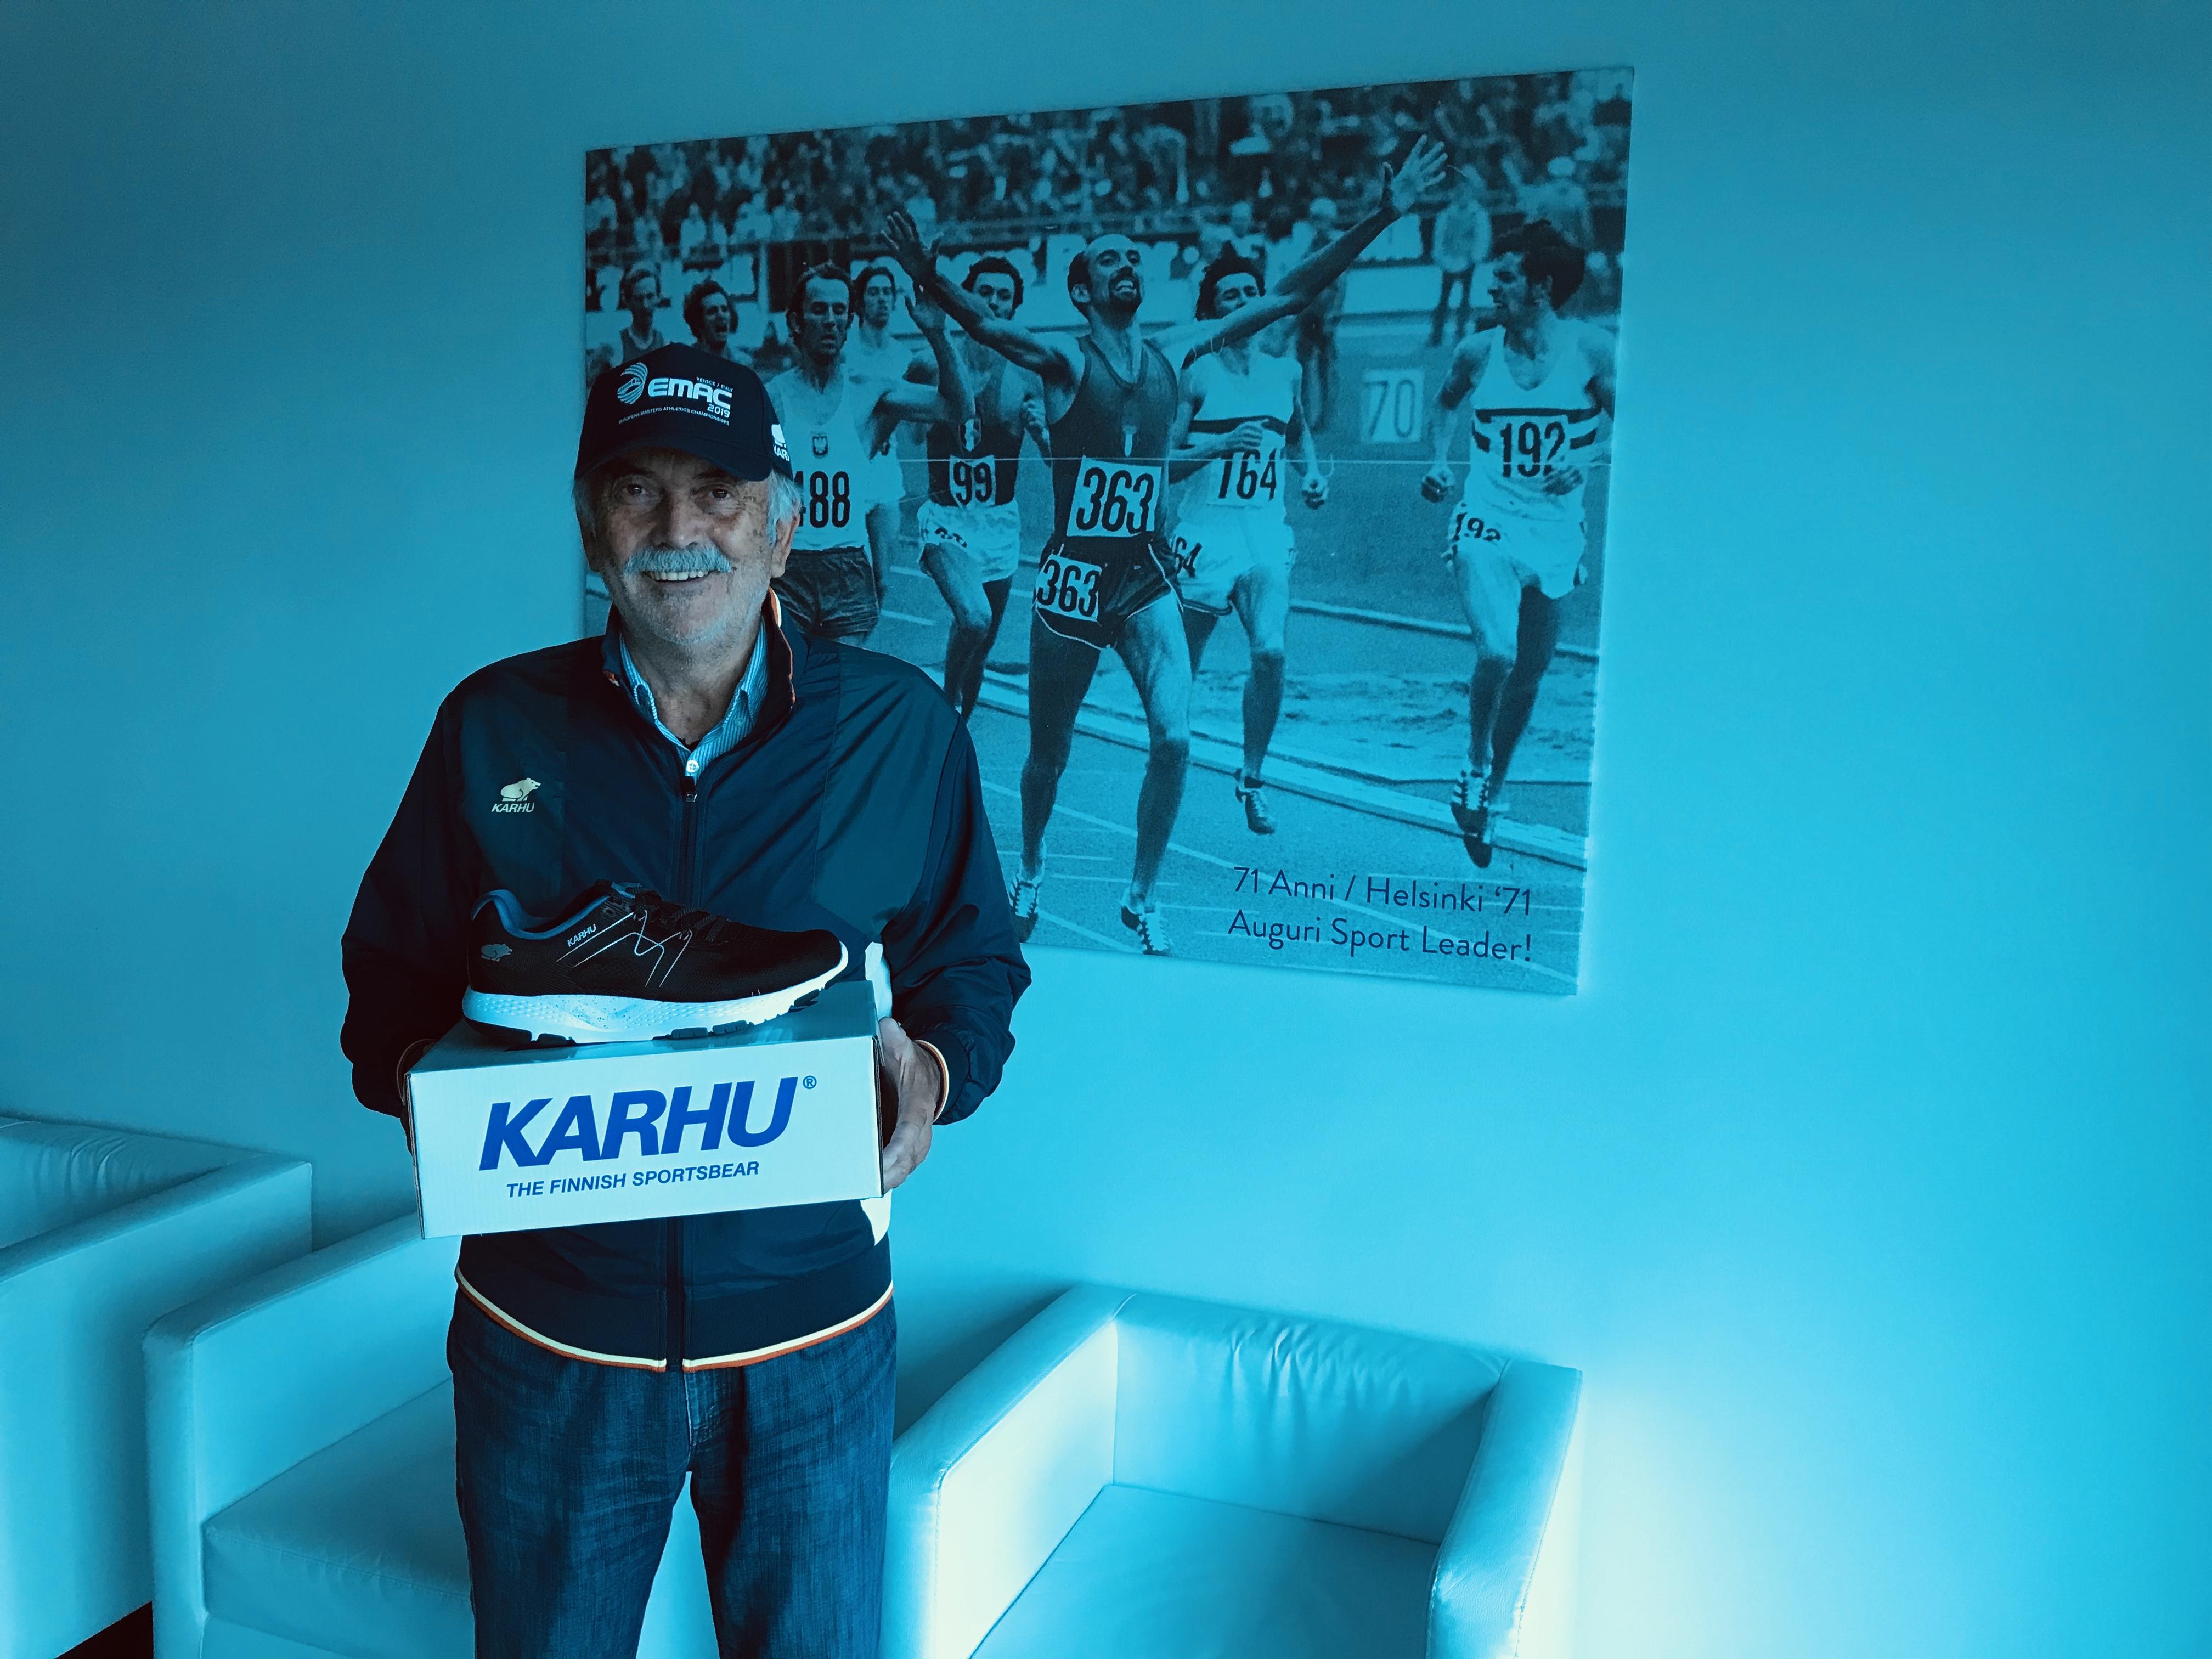 Karhu Ikoni from a distributor in Italy